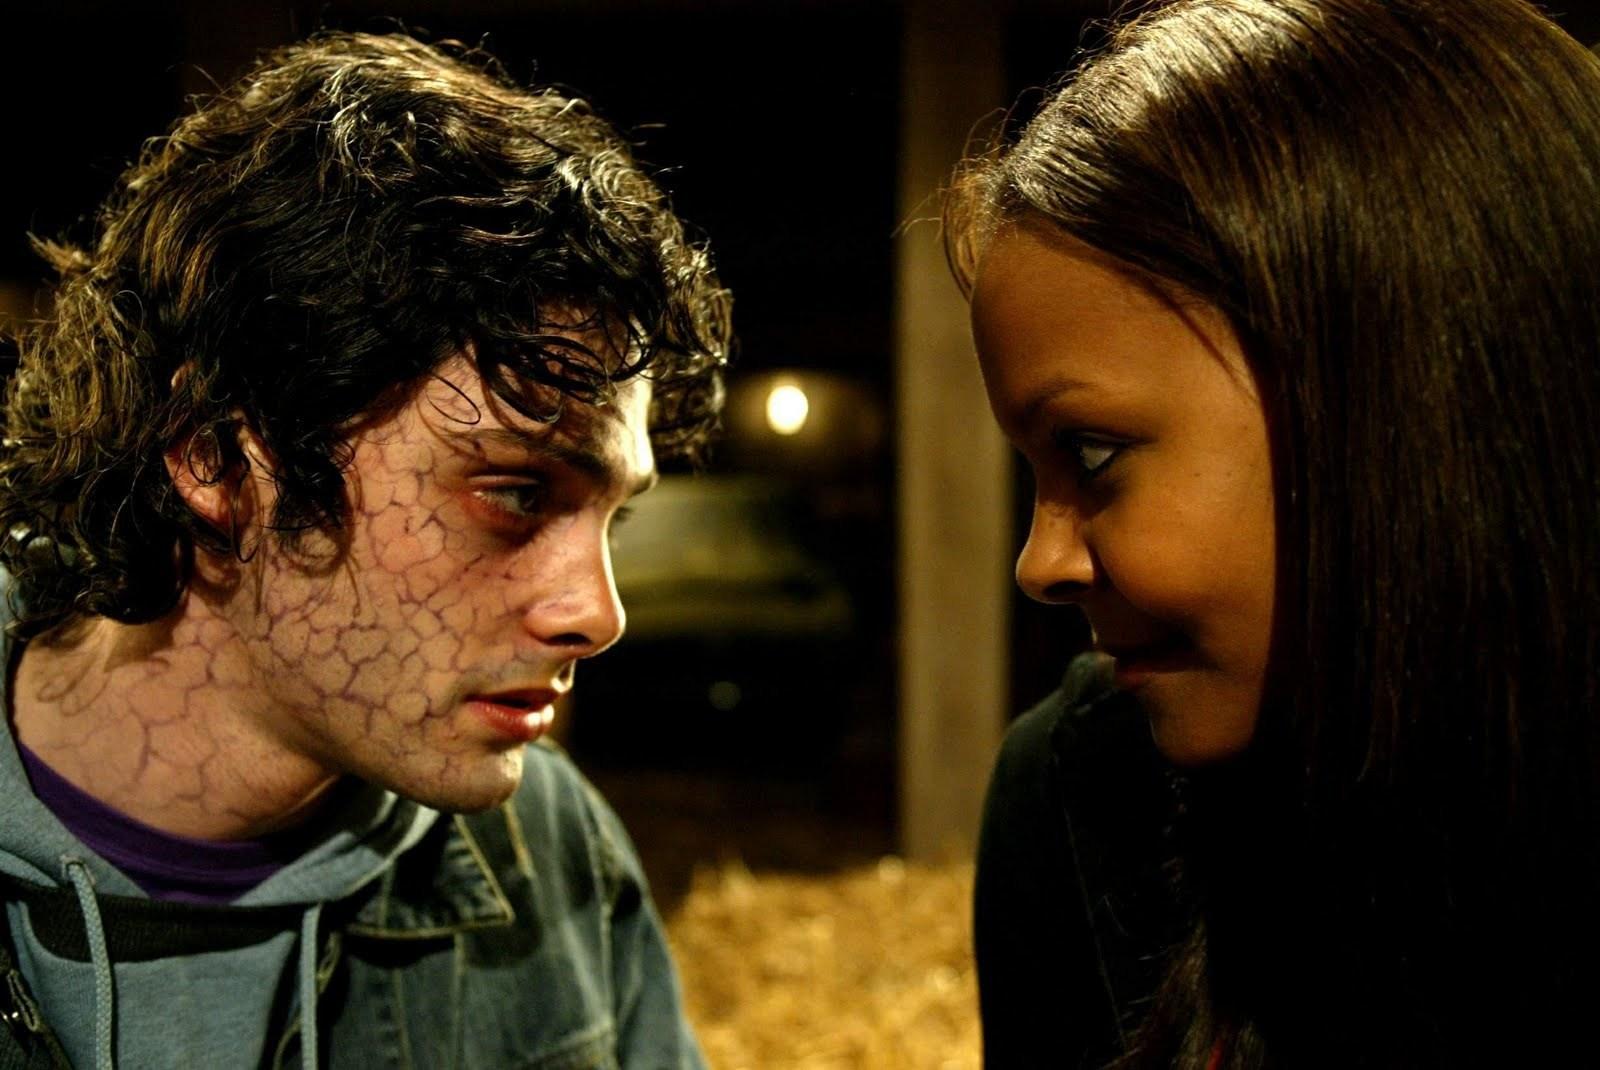 A zombified David Leon and his love interest Samantha Mumba in Boy Eats Girl (2005)